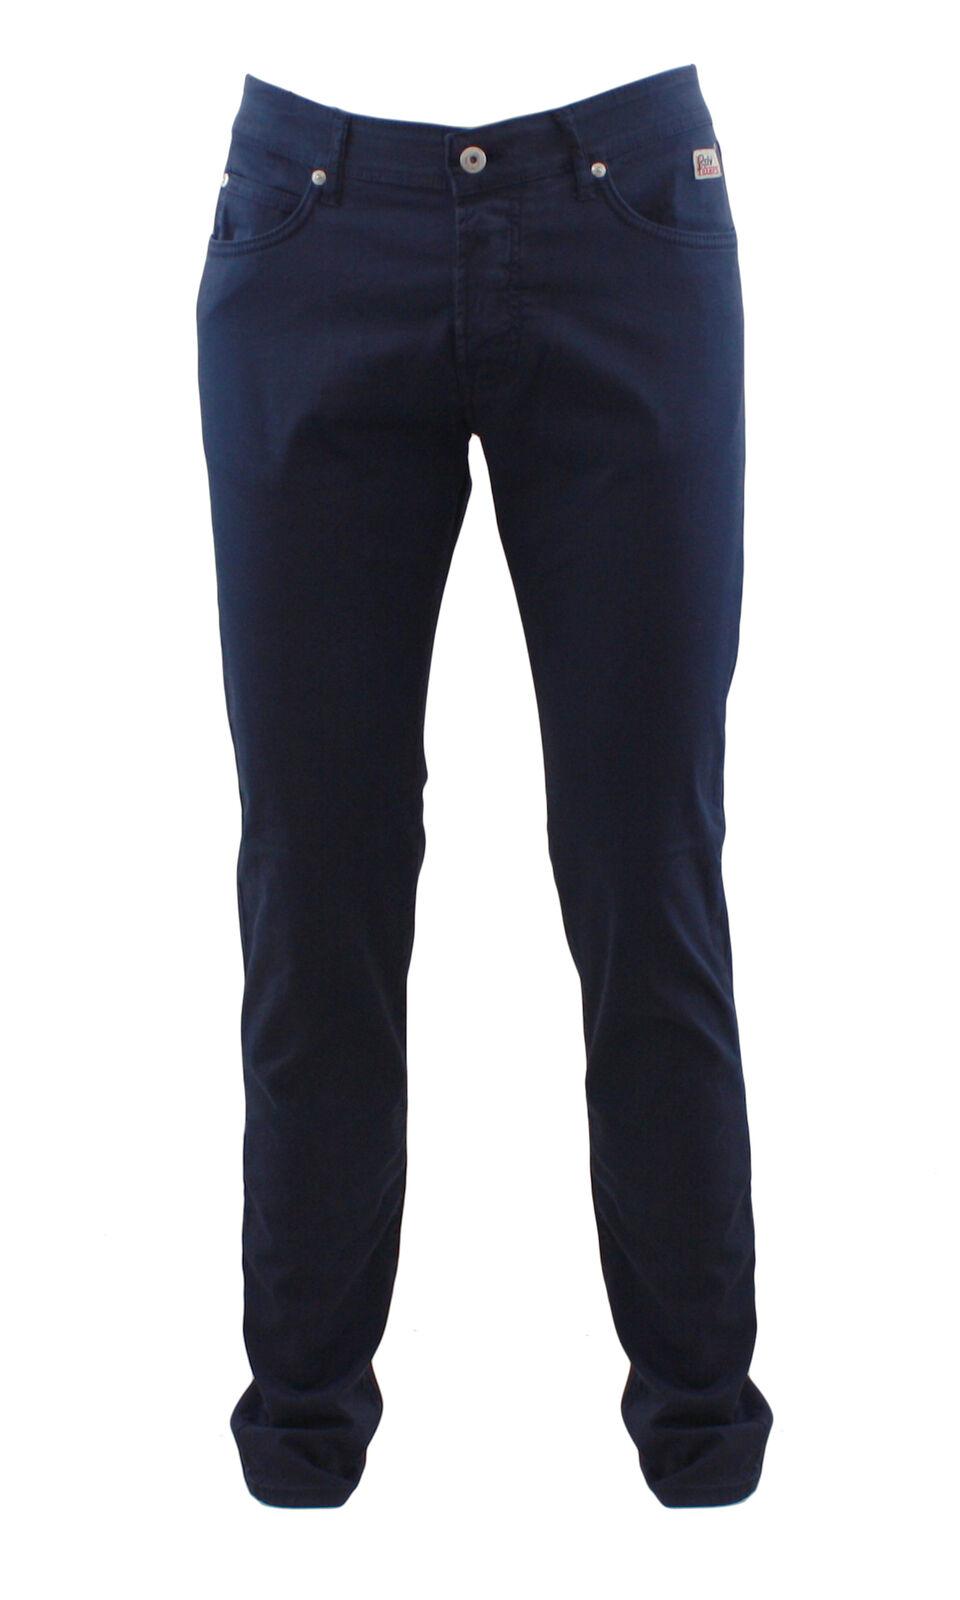 Roy Roger's pantalone da uomo colore blu Roy Roger's Roger's Roger's 529 SUMMERBLU b9f23e